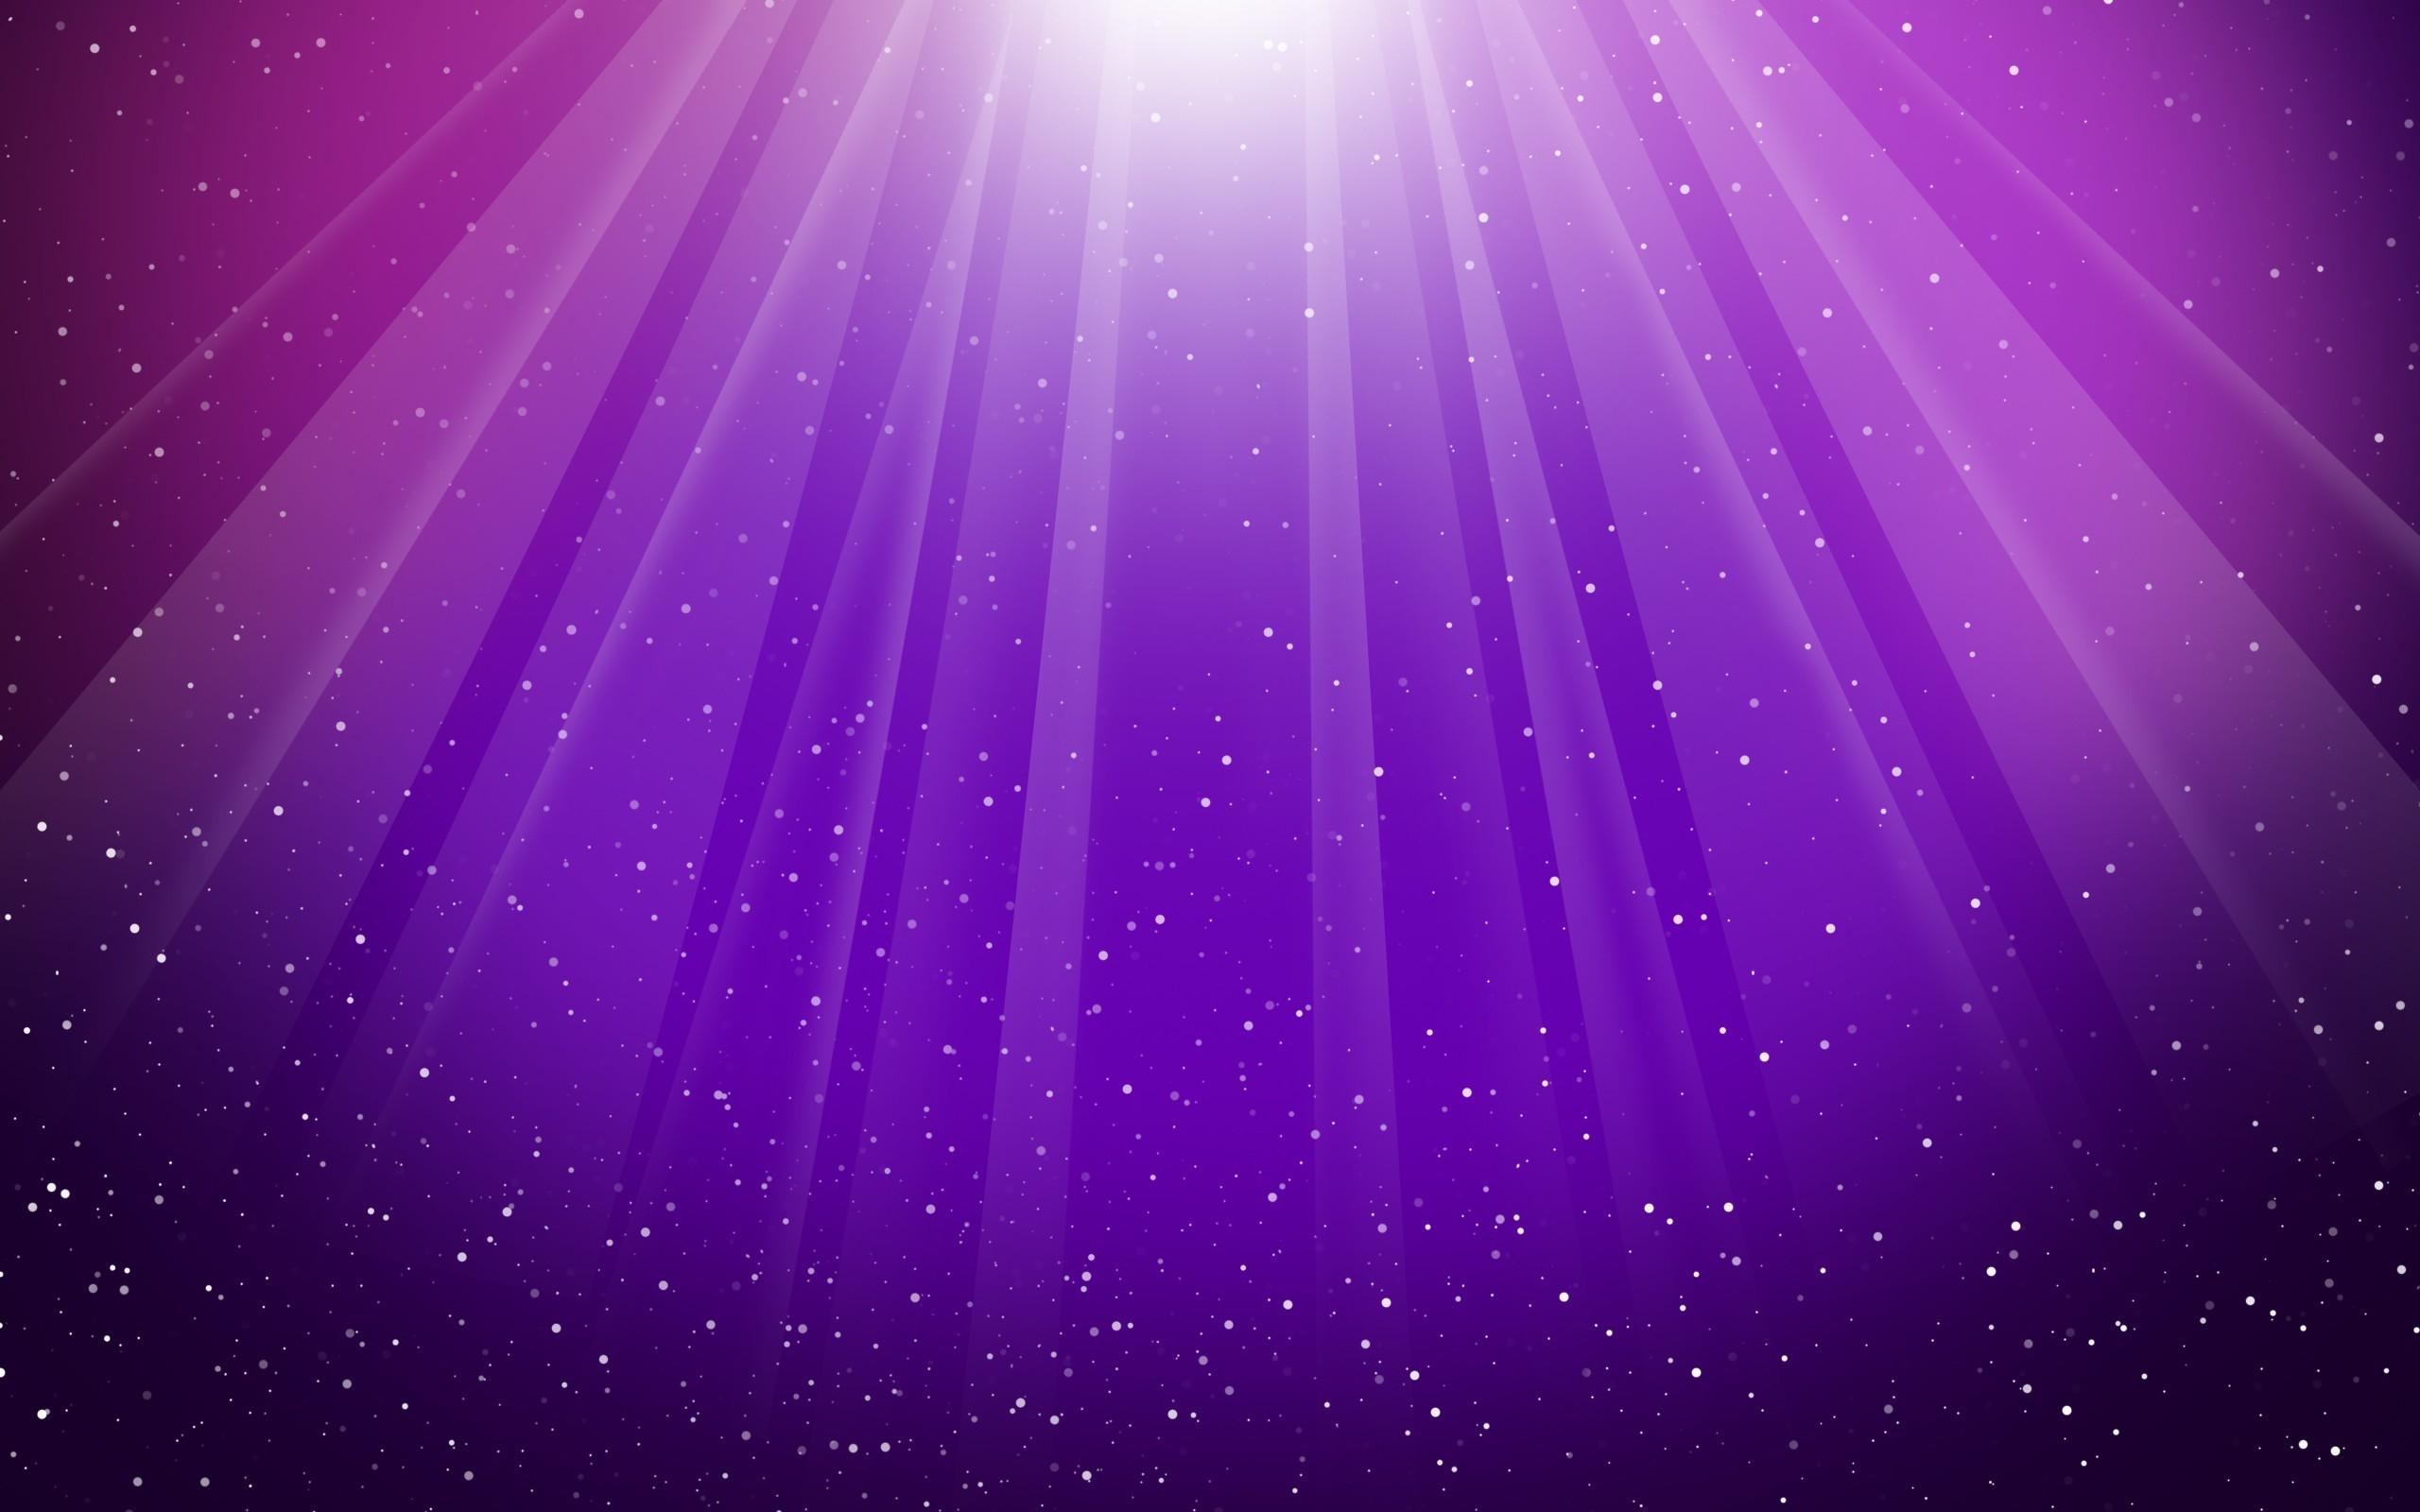 2560x1600 Px Galaxy Purple Space Stars